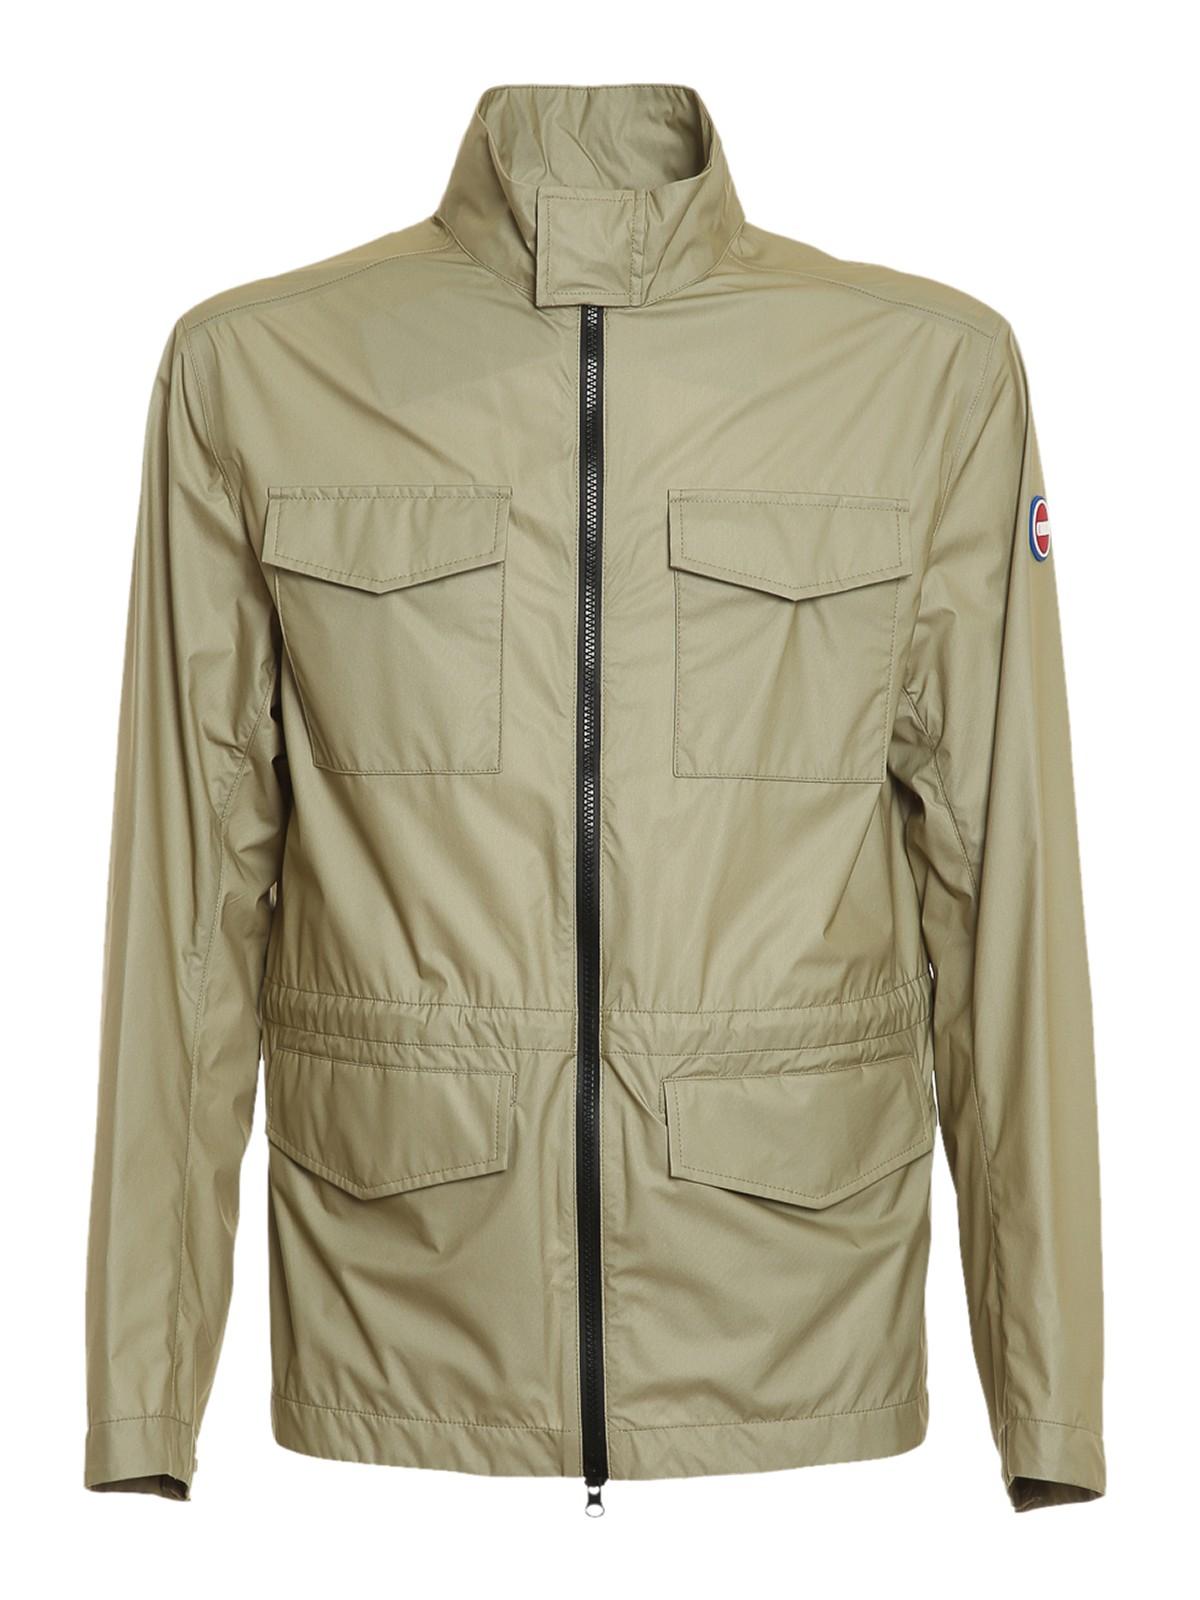 Colmar Originals Waterproof Field Jacket In Beige